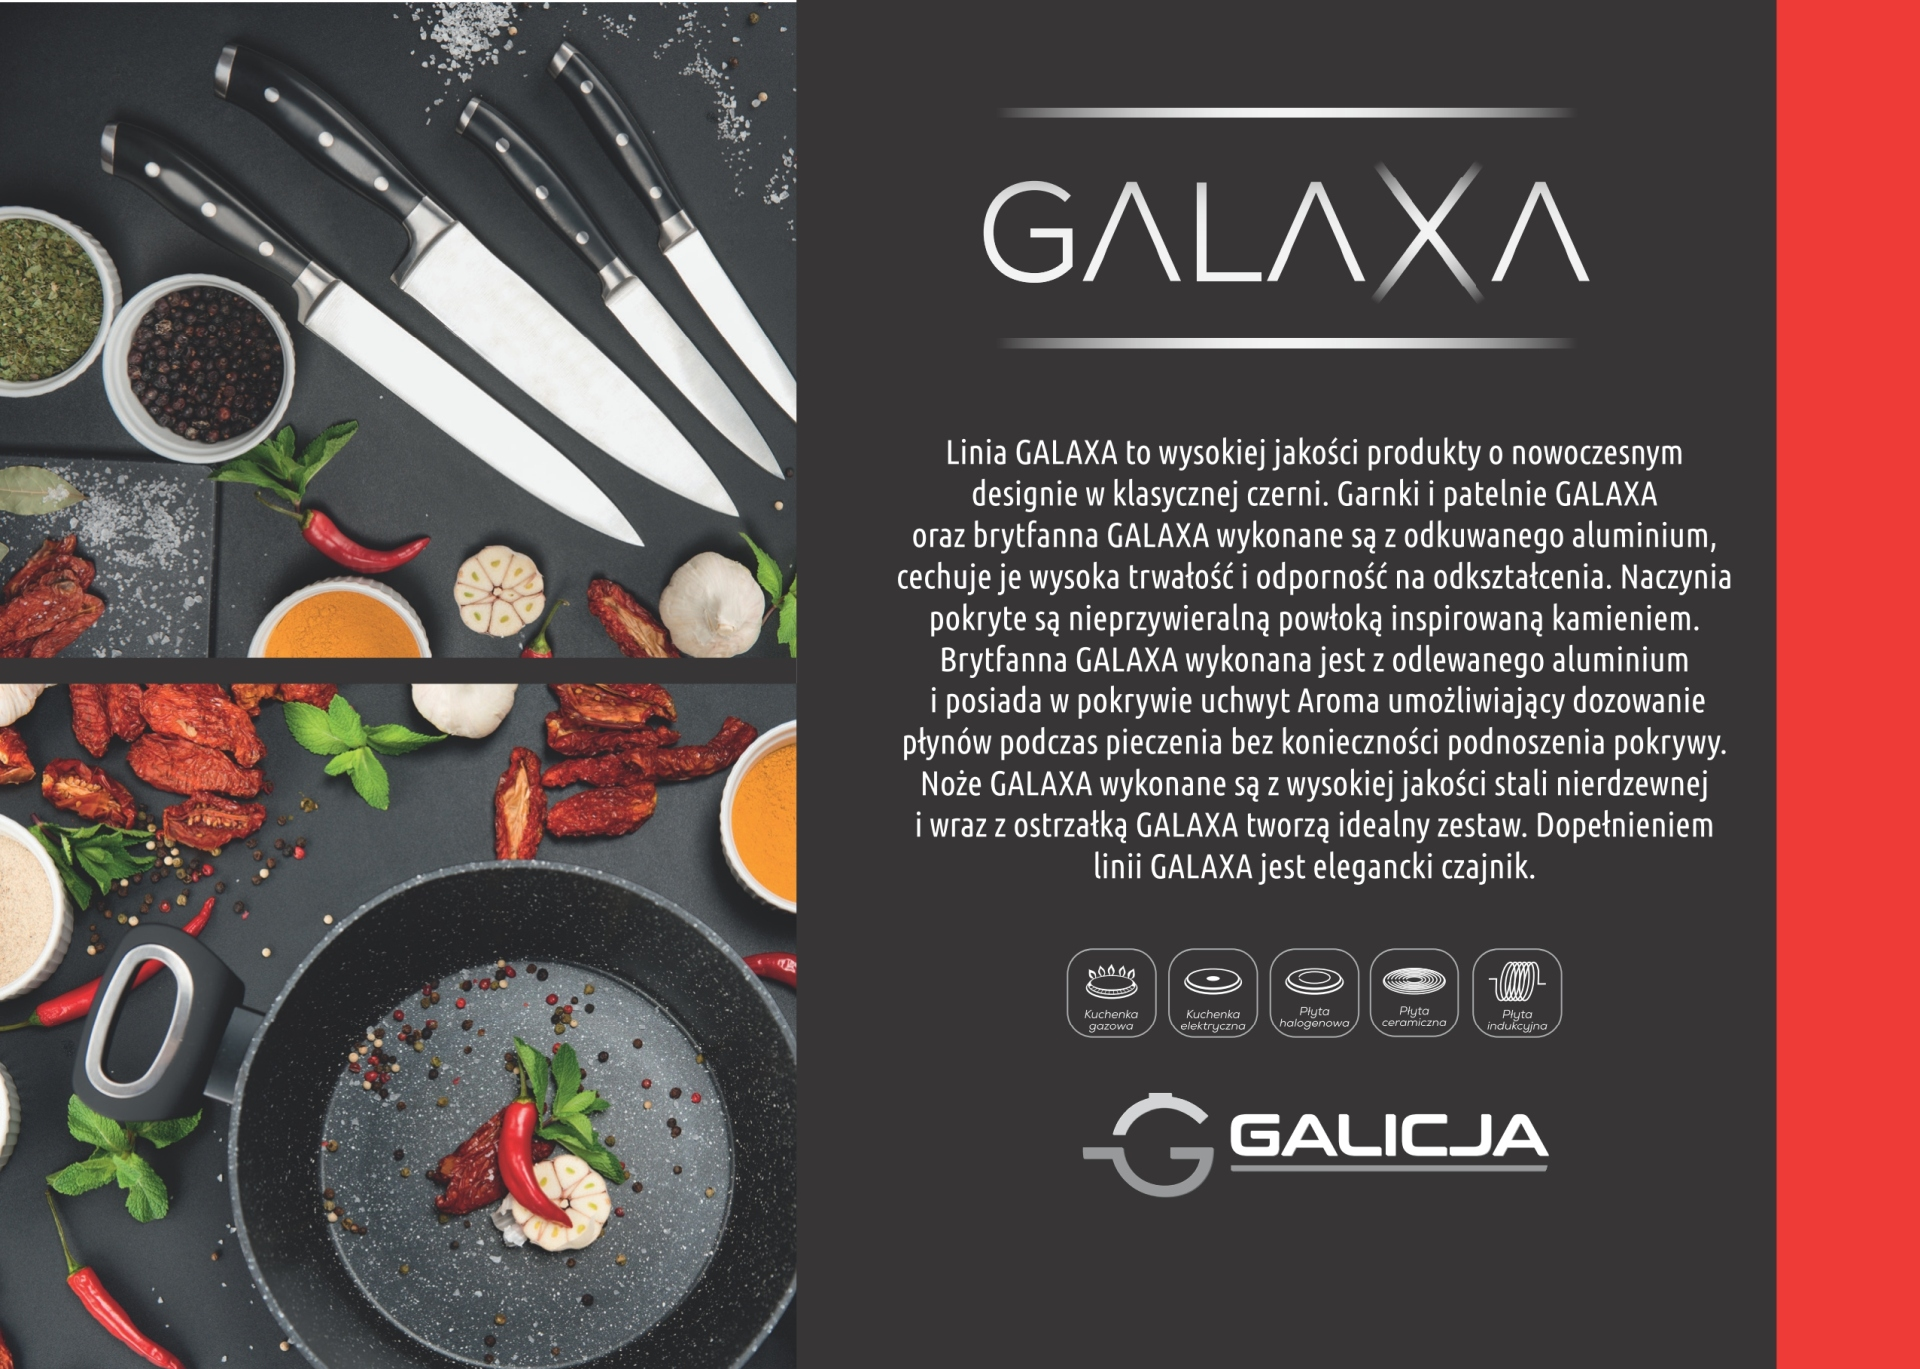 ulotka-Galaxa_4